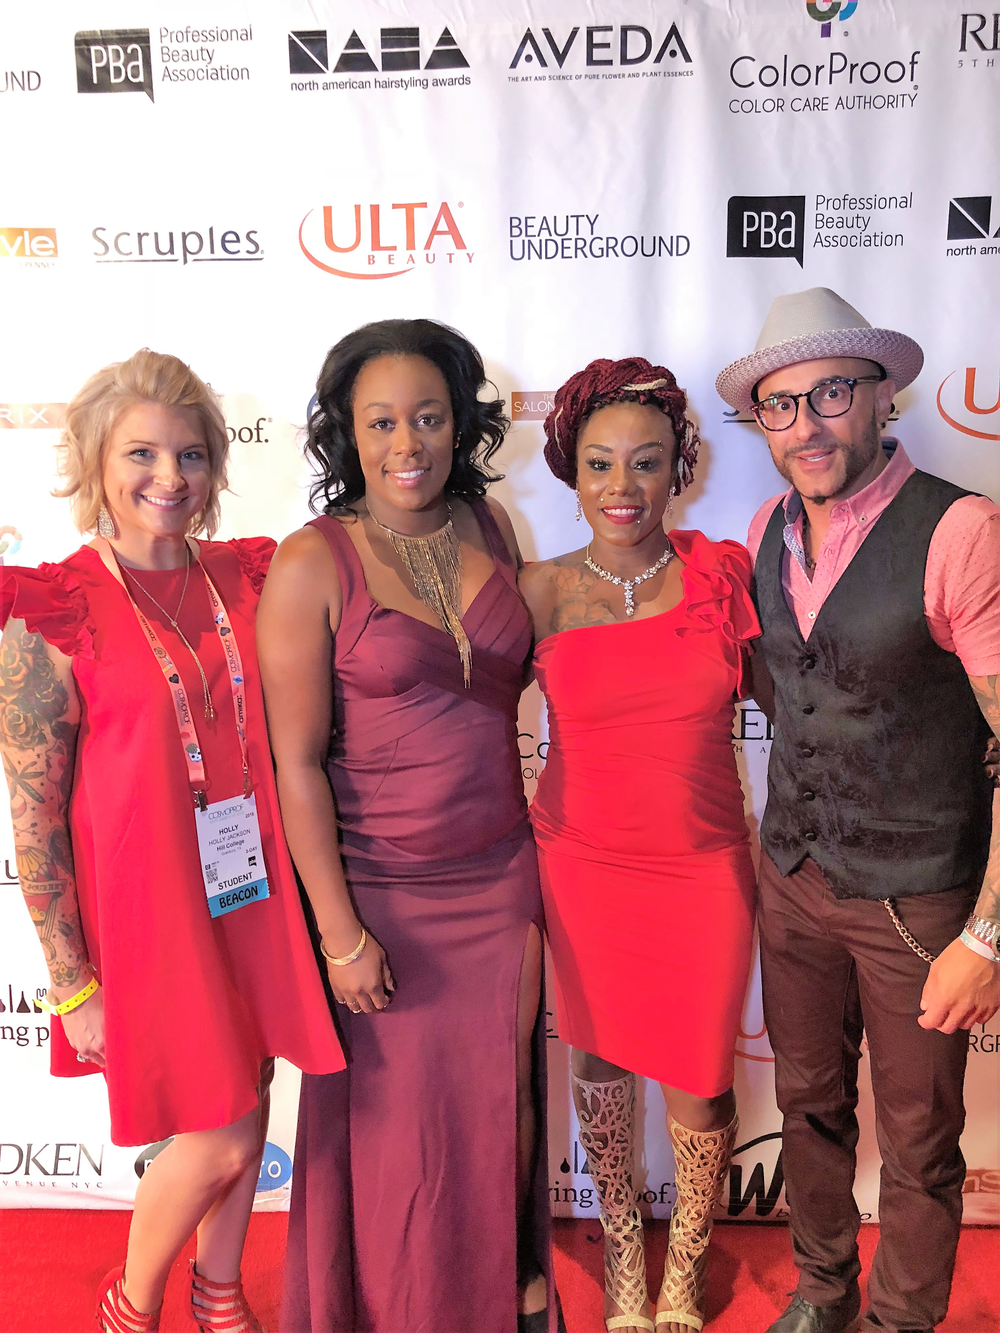 Holly Jackson, Natasha Rogers, Shakira White,and Rocky Vitelli at NAHA